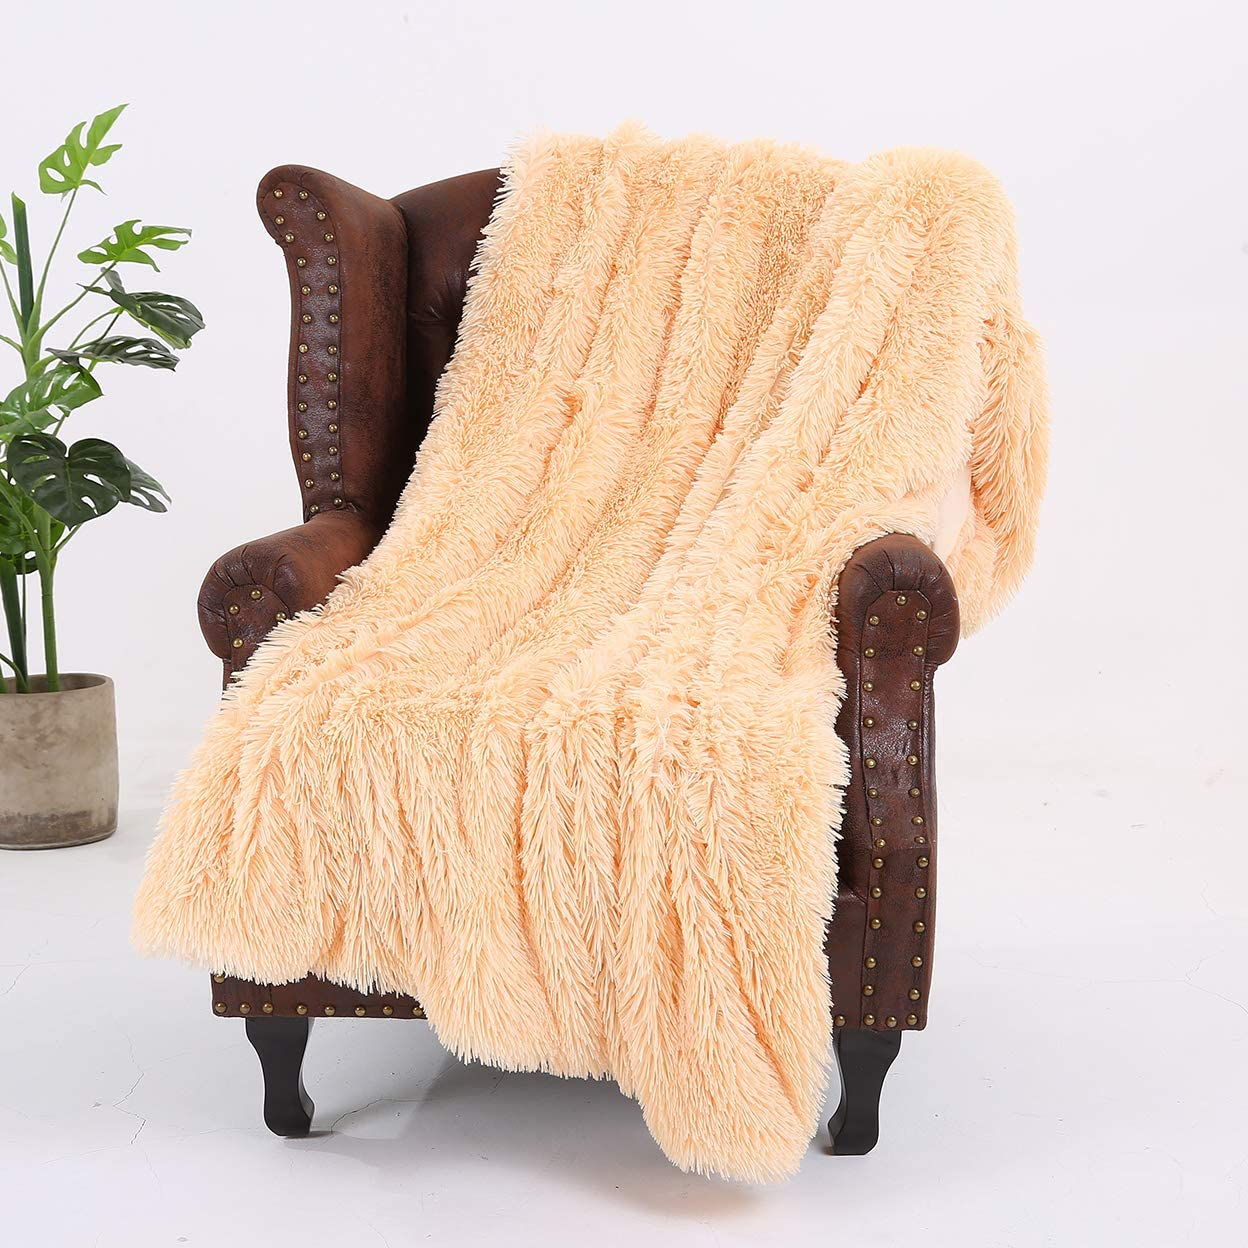 150 x 200 cm esponjoso pelo largo para decoraci/ón de sof/á y cama latte, doble Manta de pelo sint/ético supersuave con dise/ño de rayas de vell/ón de cristal